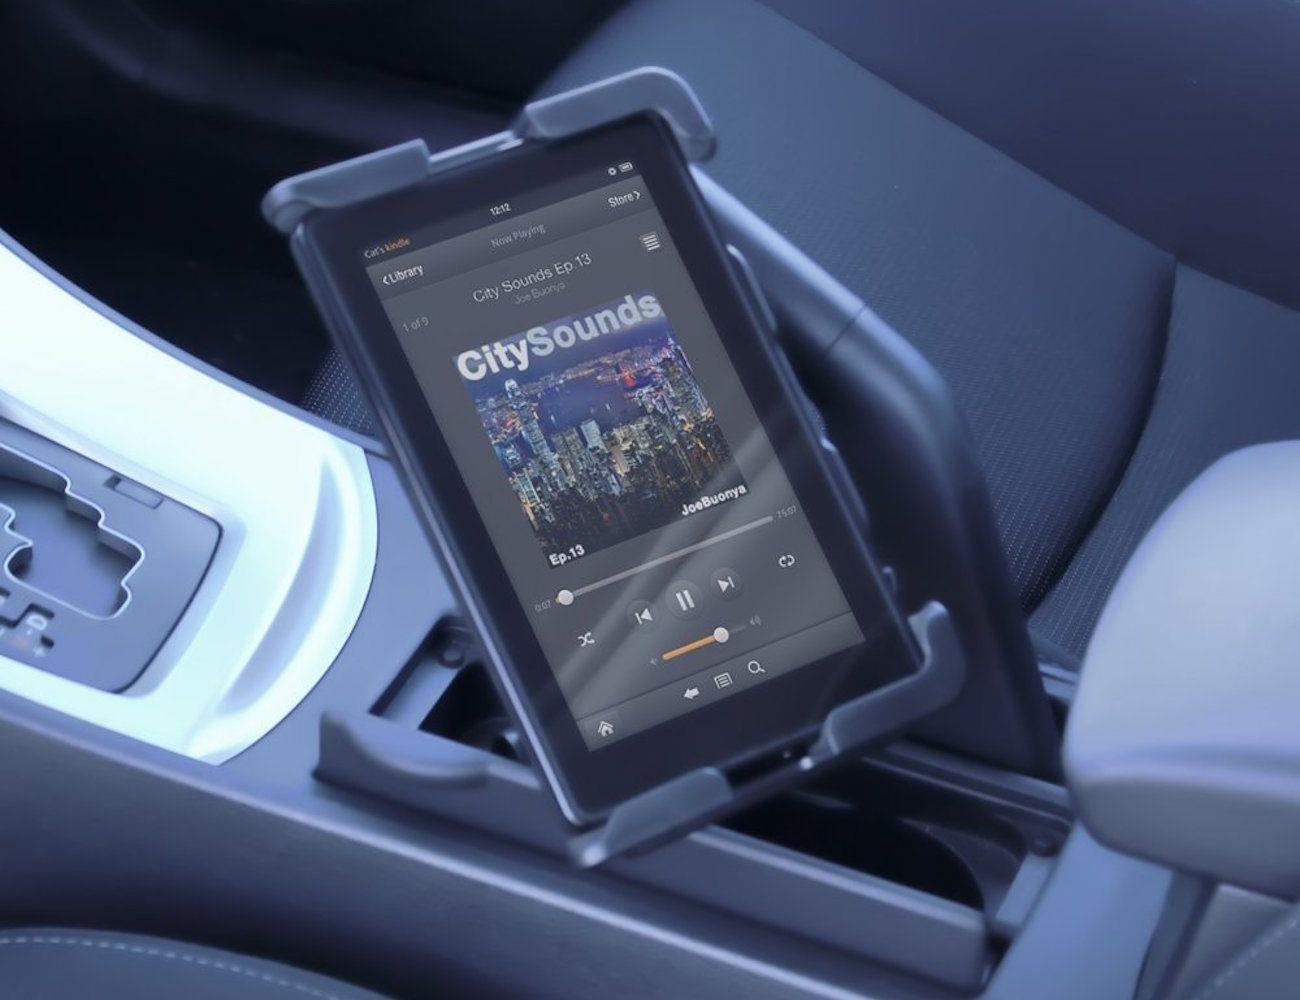 Satechi sch cupholder smartphone u tabletmount designed for